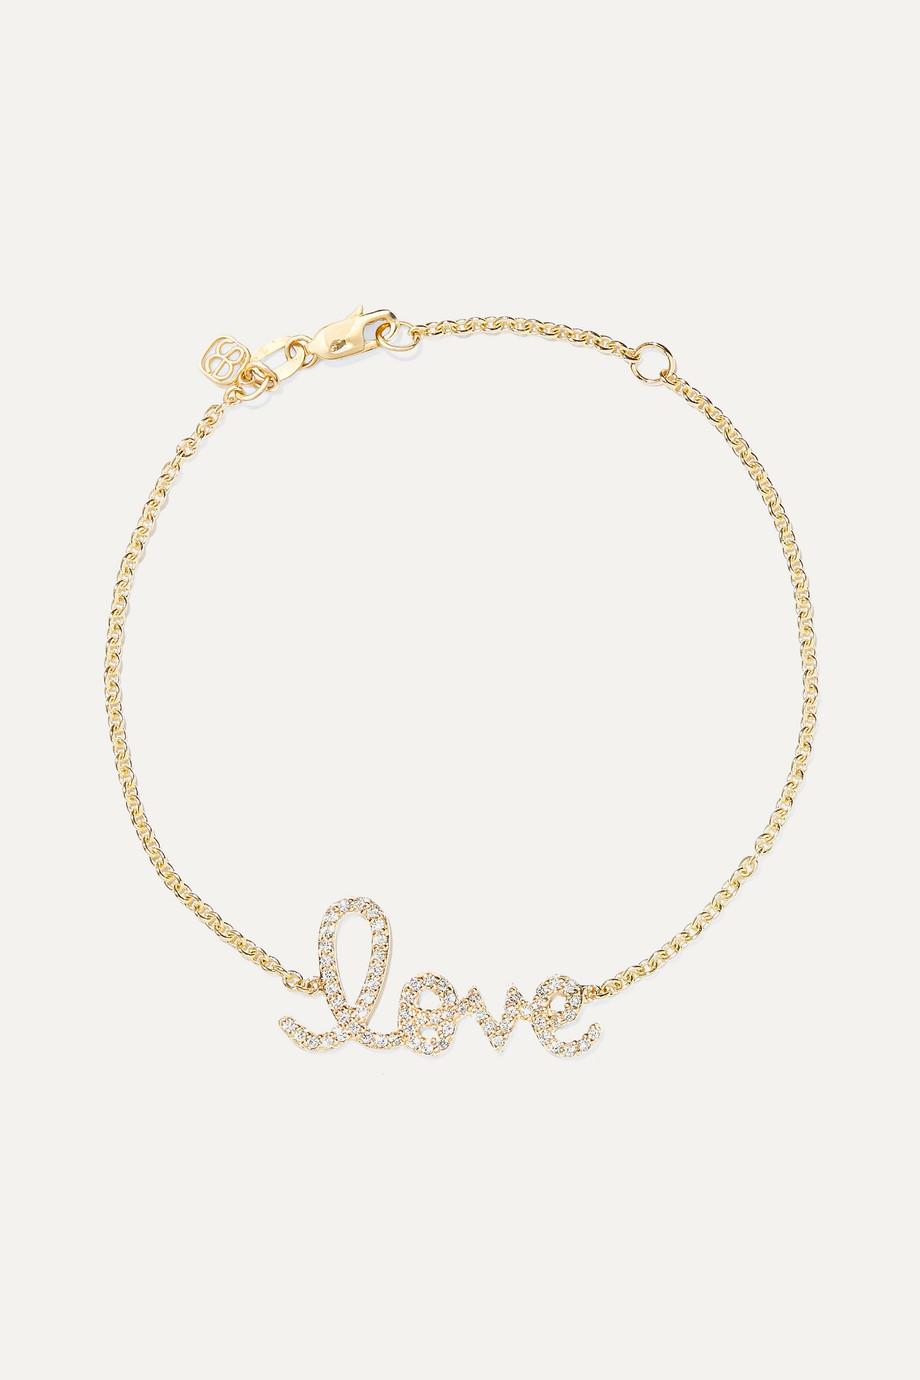 Sydney Evan Bracelet en or 14 carats et diamants Love Medium